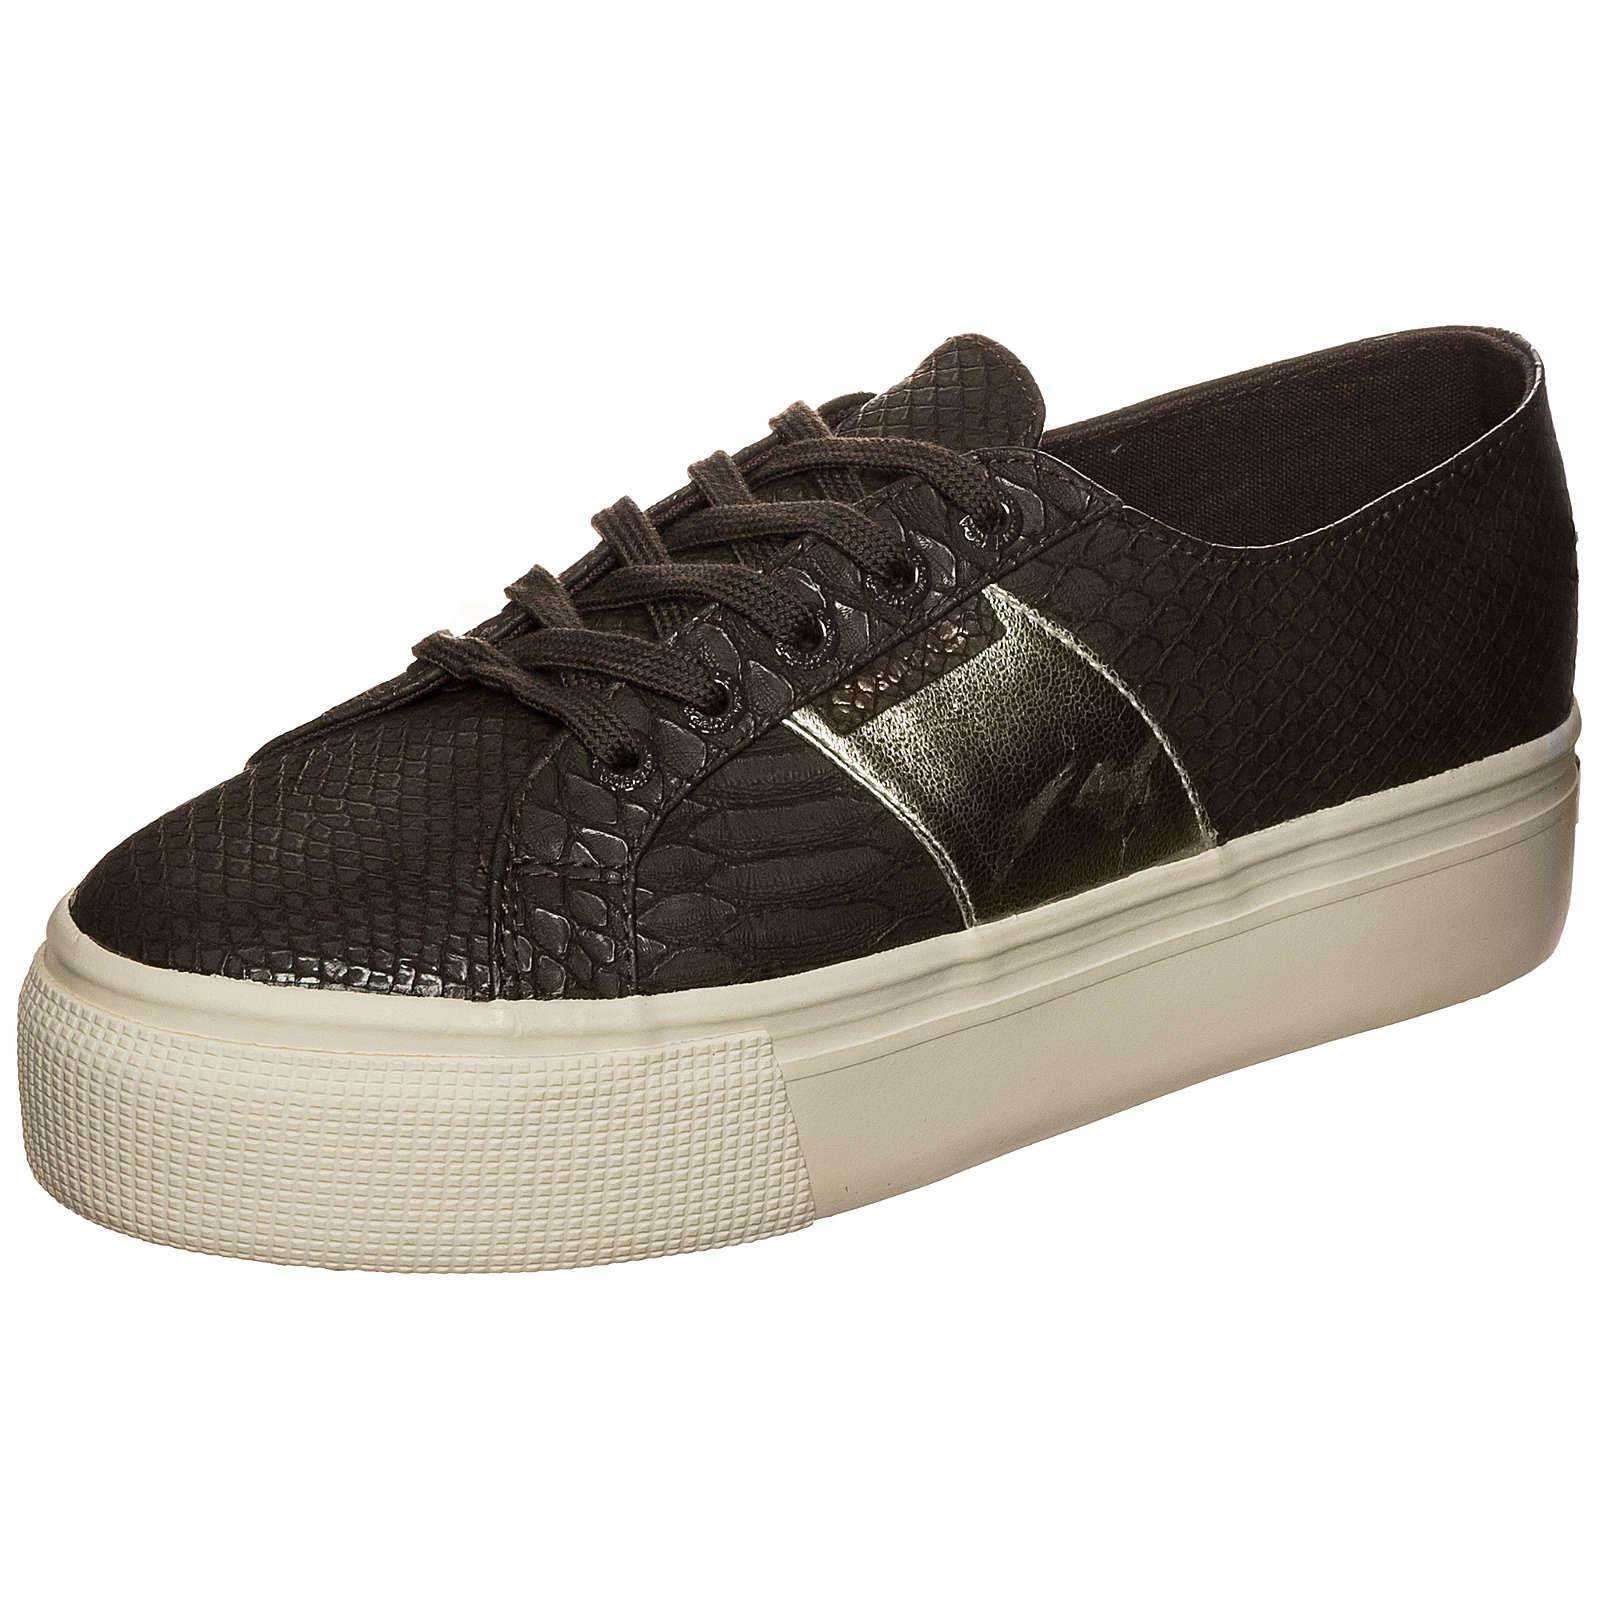 Superga® Sneakers 2790 braun Damen Gr. 39